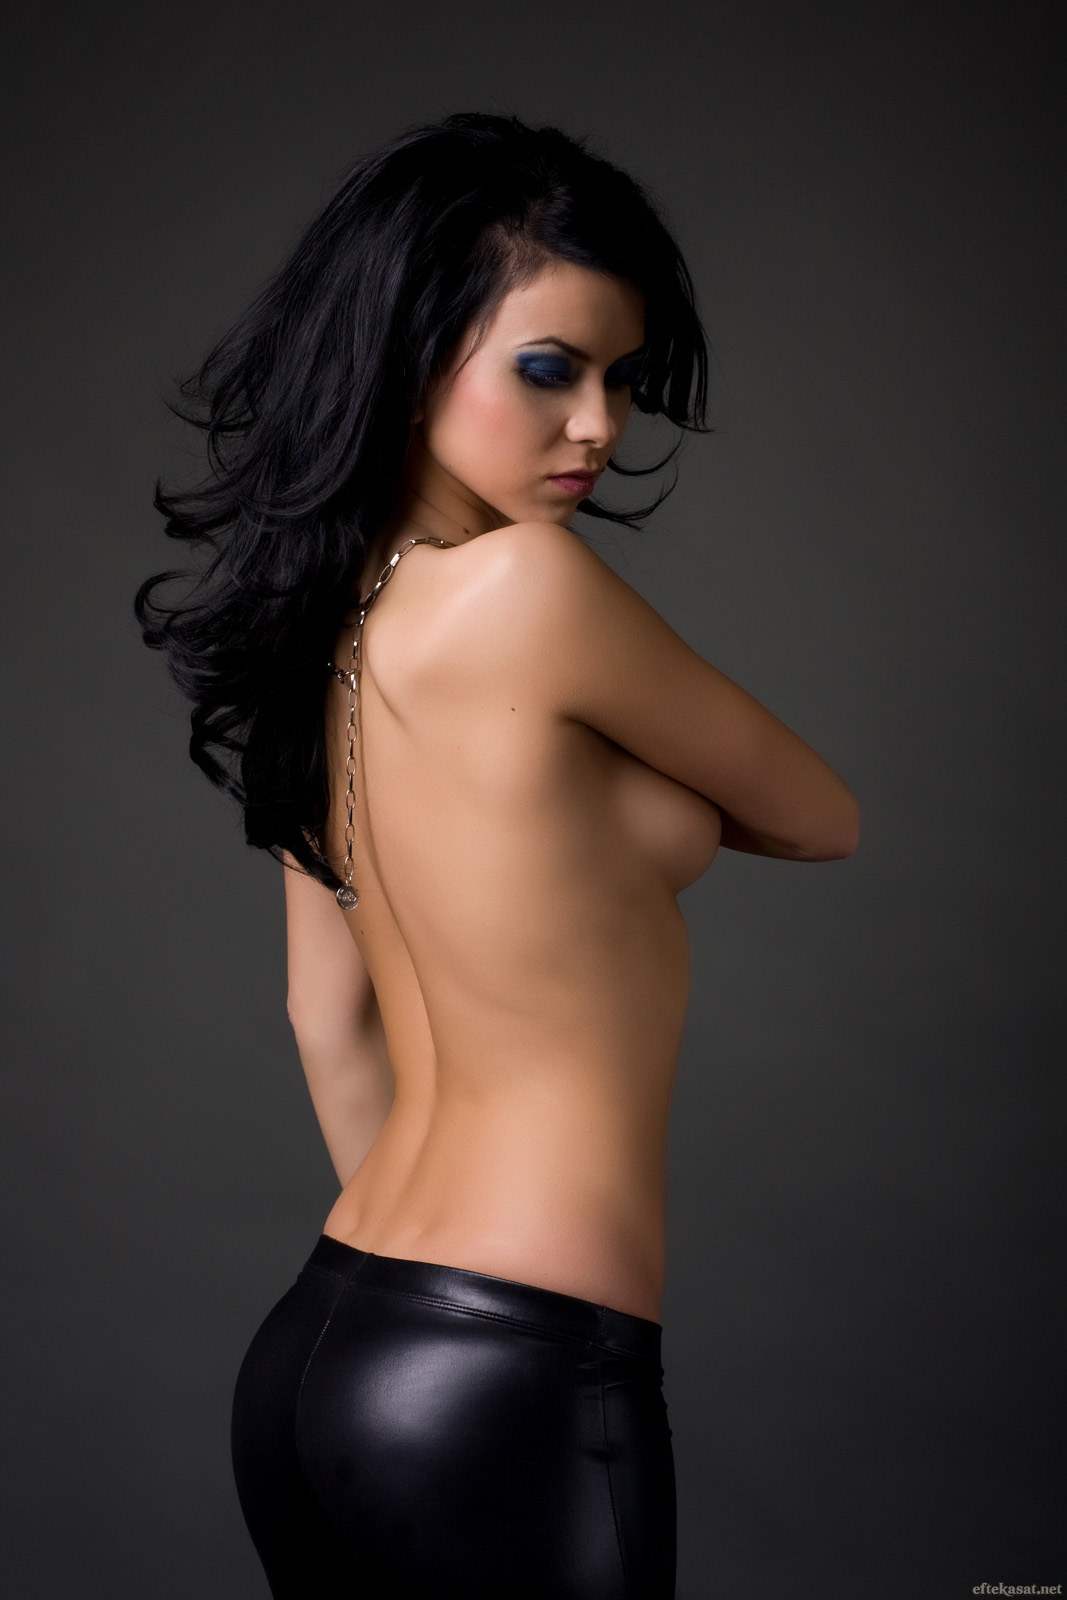 http://2.bp.blogspot.com/-wBeHQ58qUbg/UNcoYZpXjiI/AAAAAAAADvY/5Ga52K0Uw84/s1600/Inna%2B07.jpg